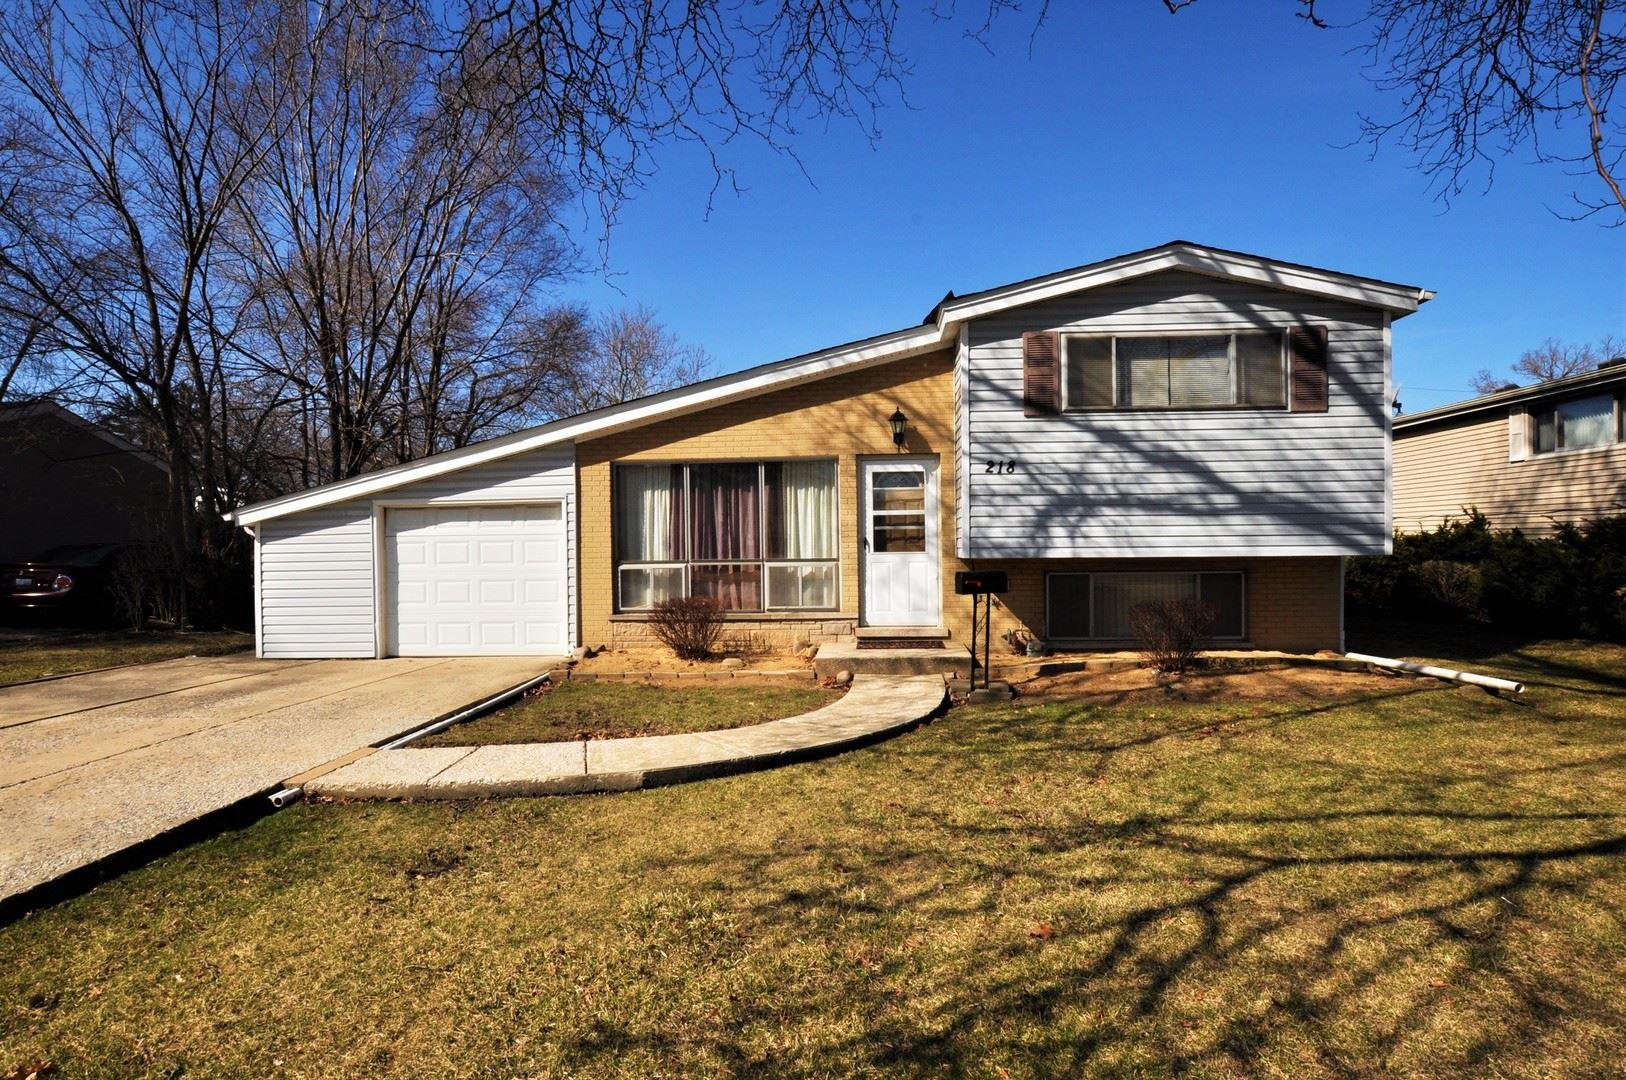 218 Donald Terrace, Glenview, IL 60025 - #: 10674061